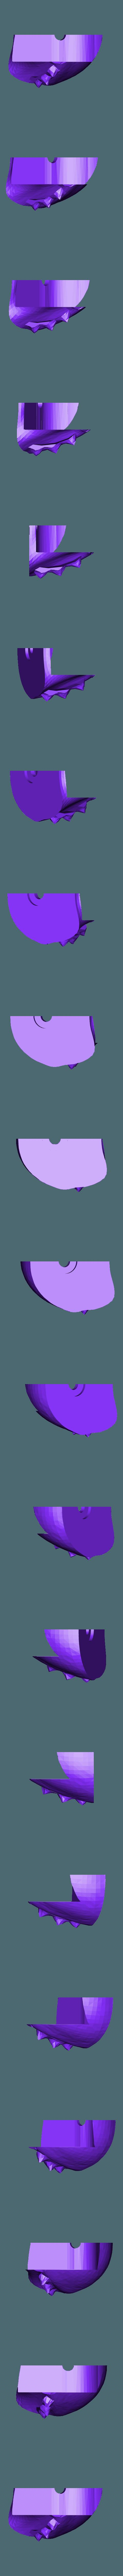 right shoulder pt2.stl Download free STL file GADGET the robotic Gremlin • 3D printing object, atarka3